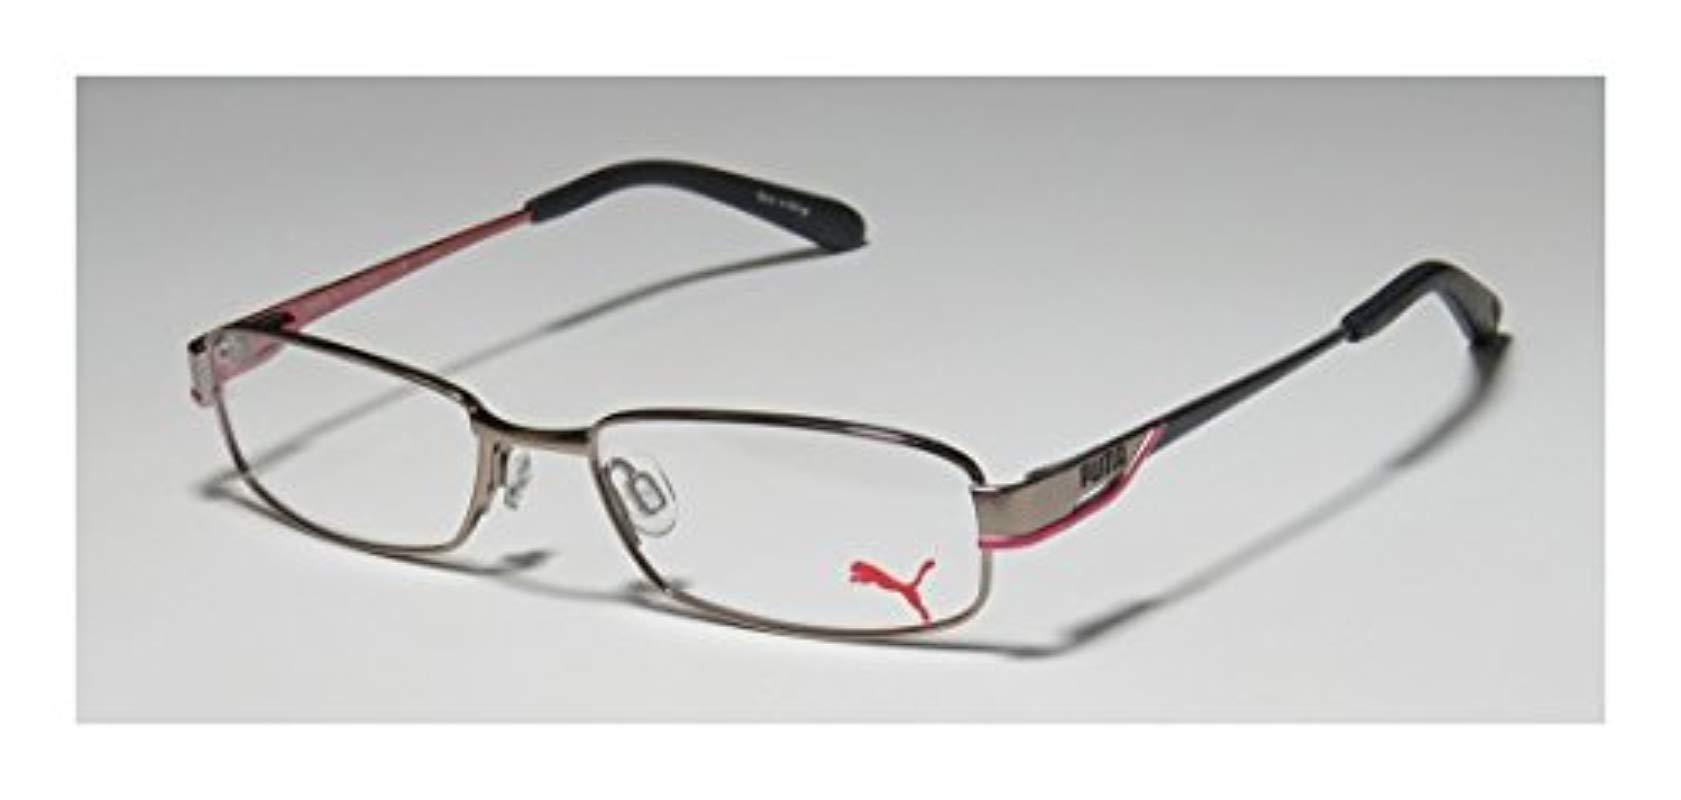 Puma 15324 Santa Fe Mens//Womens Flexible TIGHT-FIT Designed for Jogging//Cycling//Sports Activities Eyeglasses//Frame